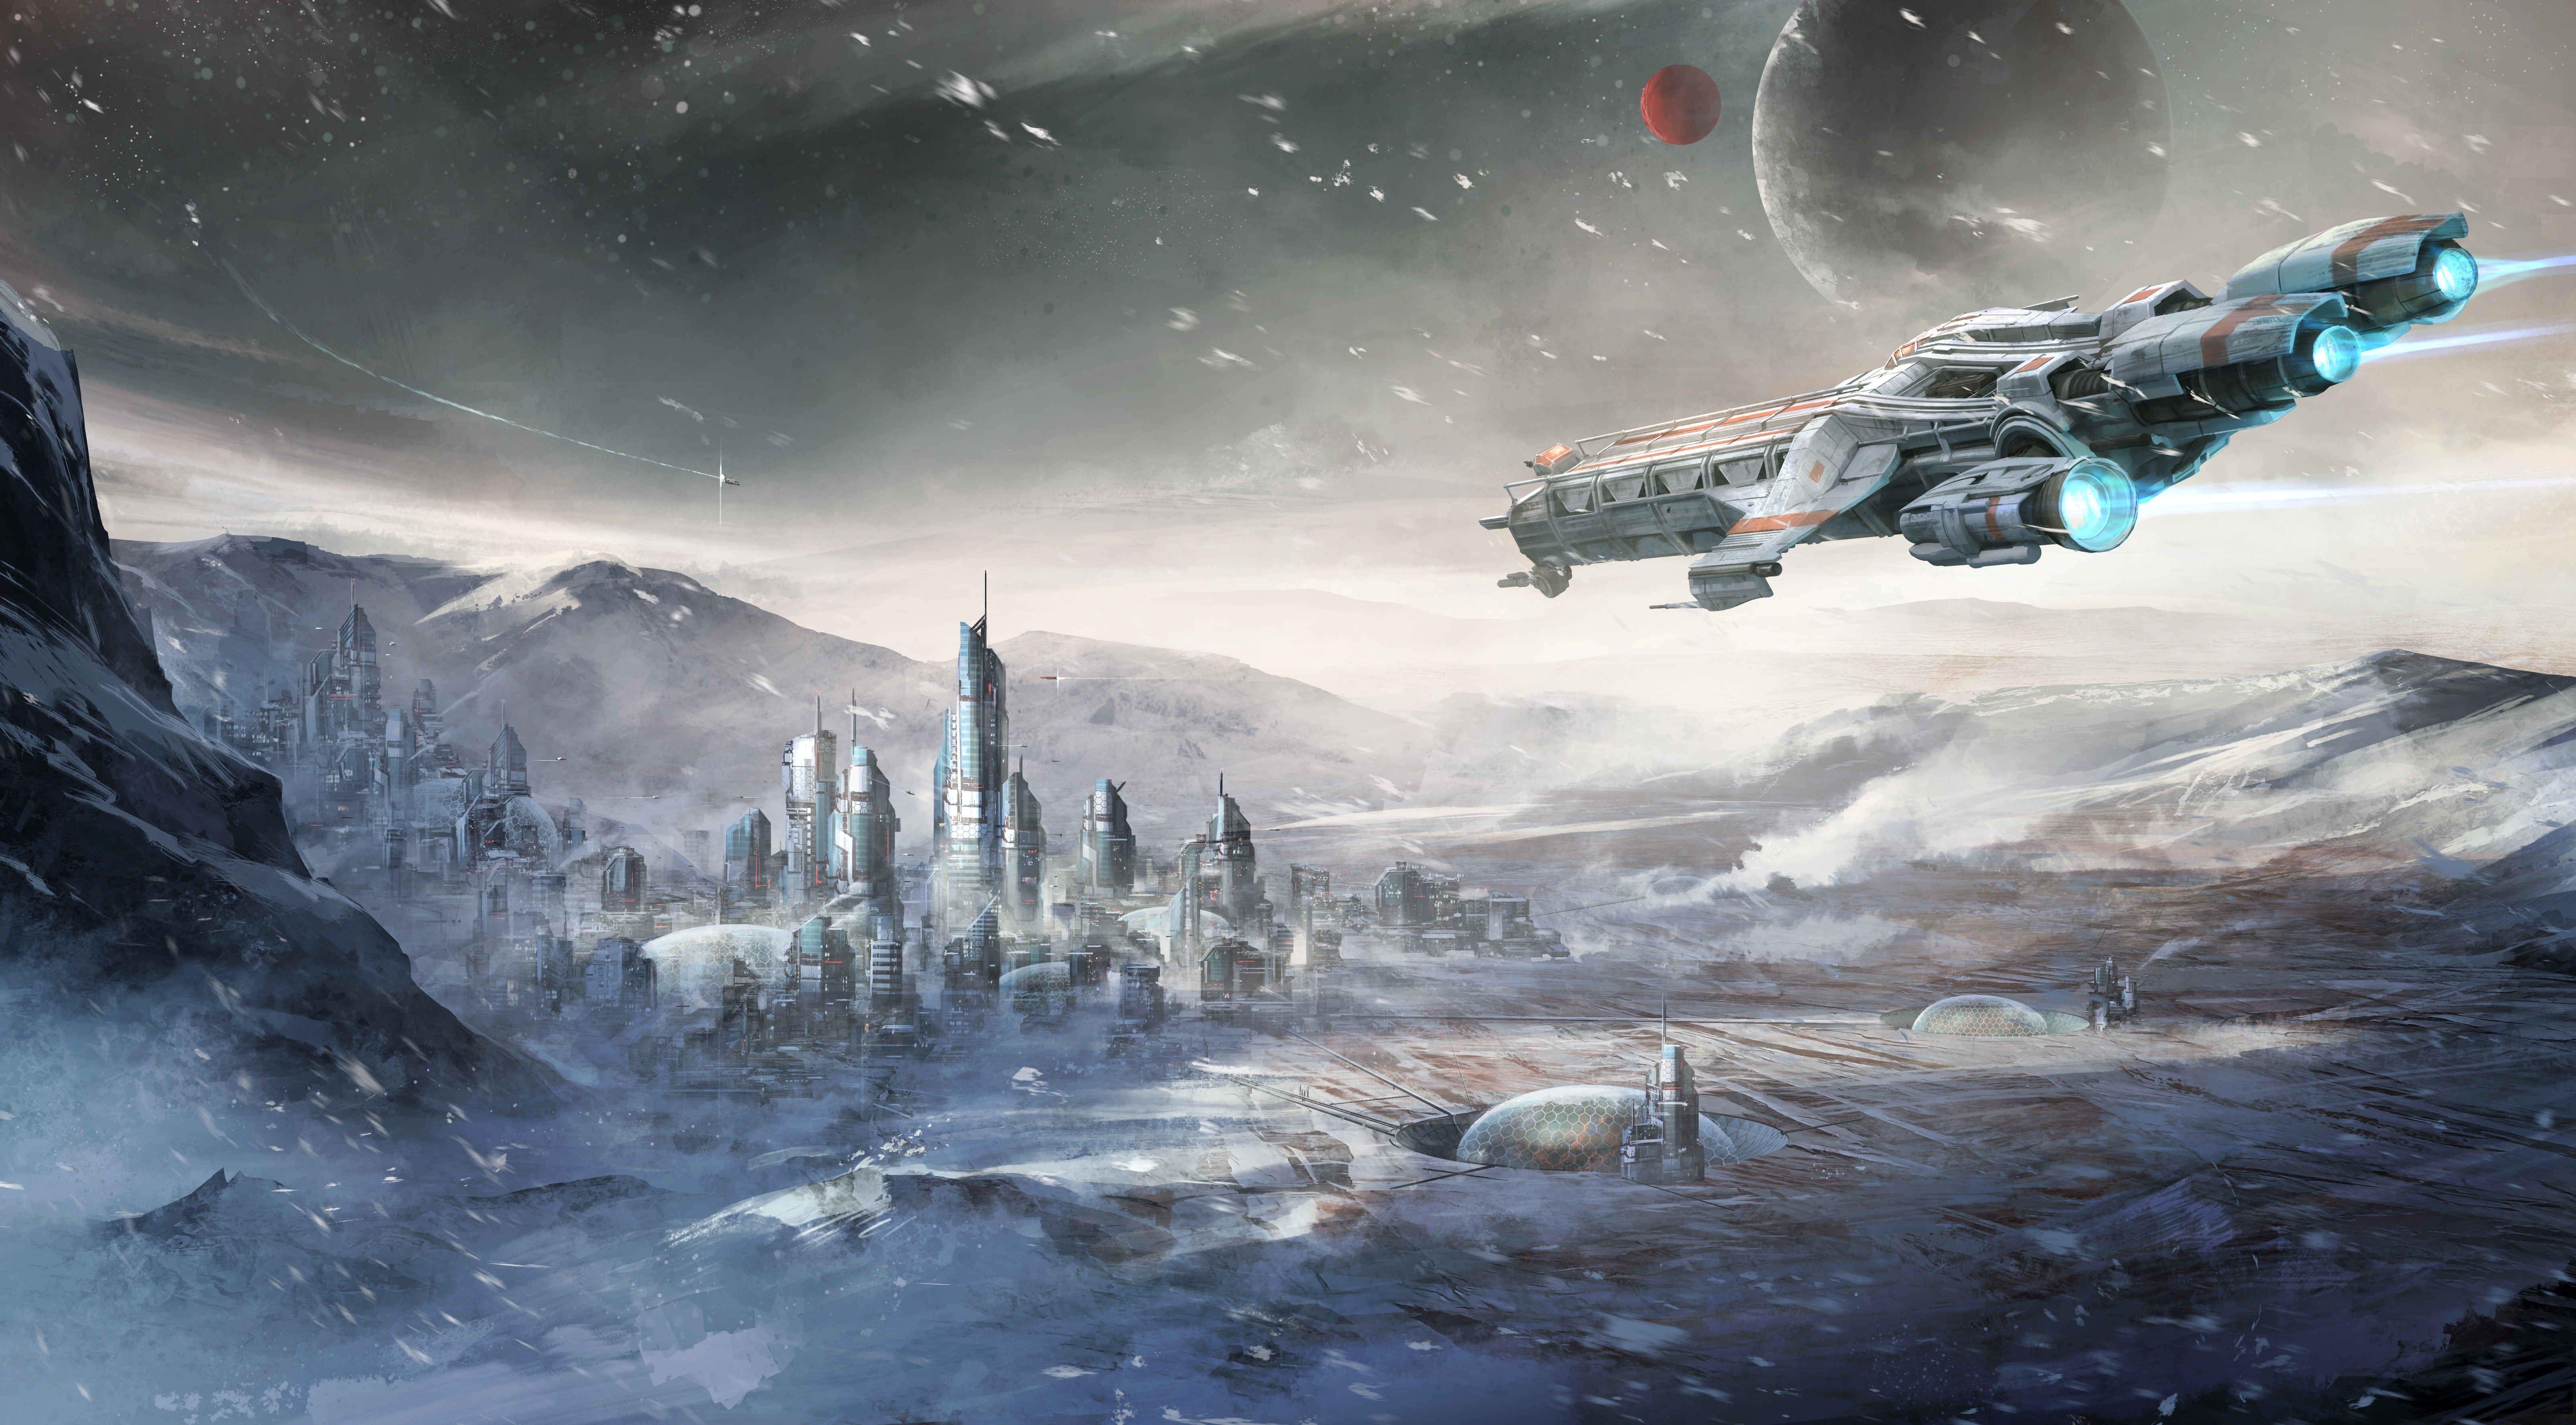 Star Citizen Wallpaper Star Citizen Concept Art Star Wars Spaceships